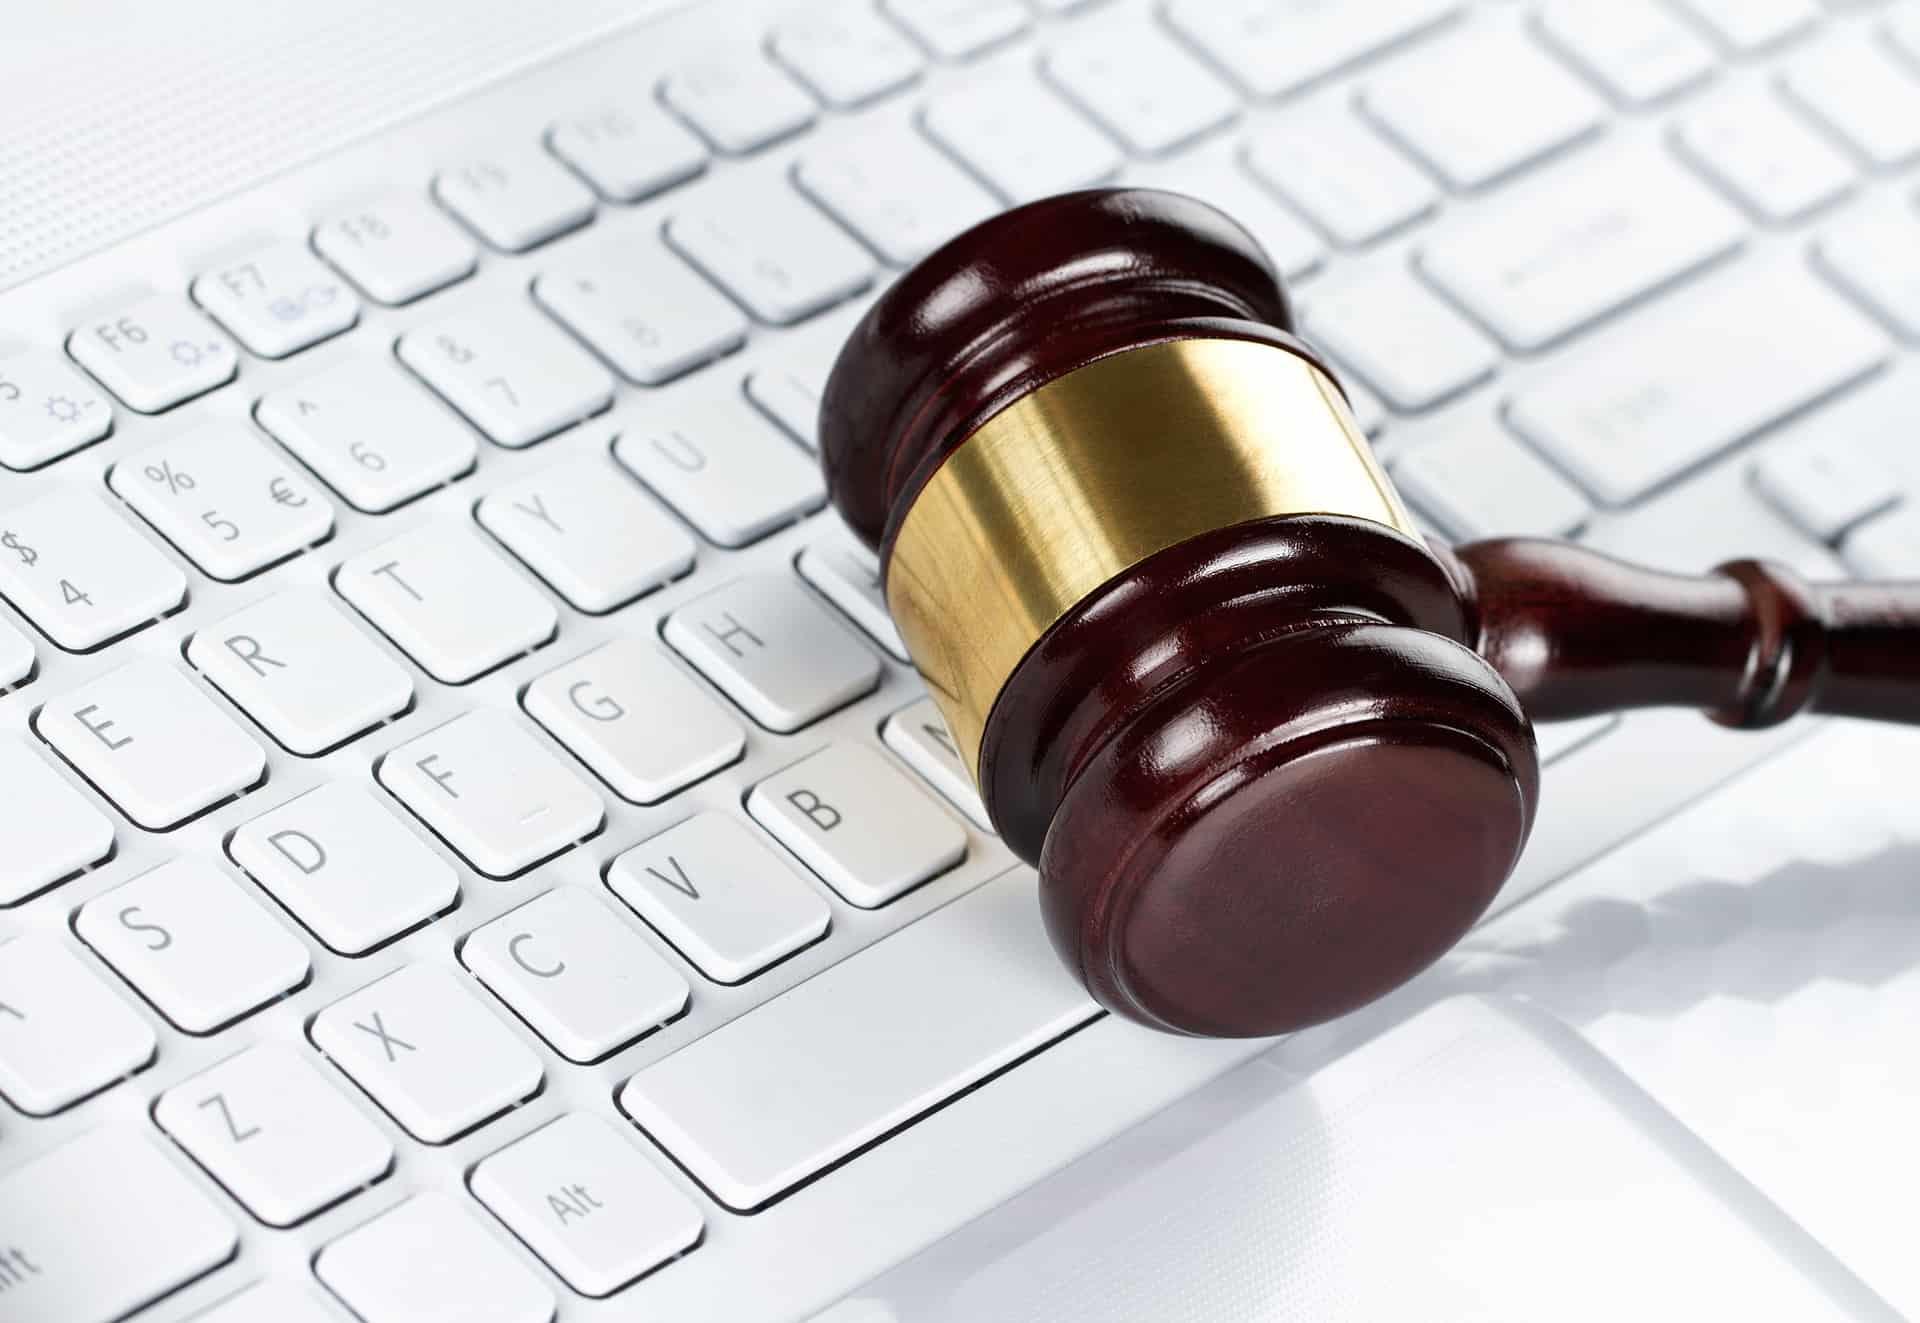 Hiring a legal content writer